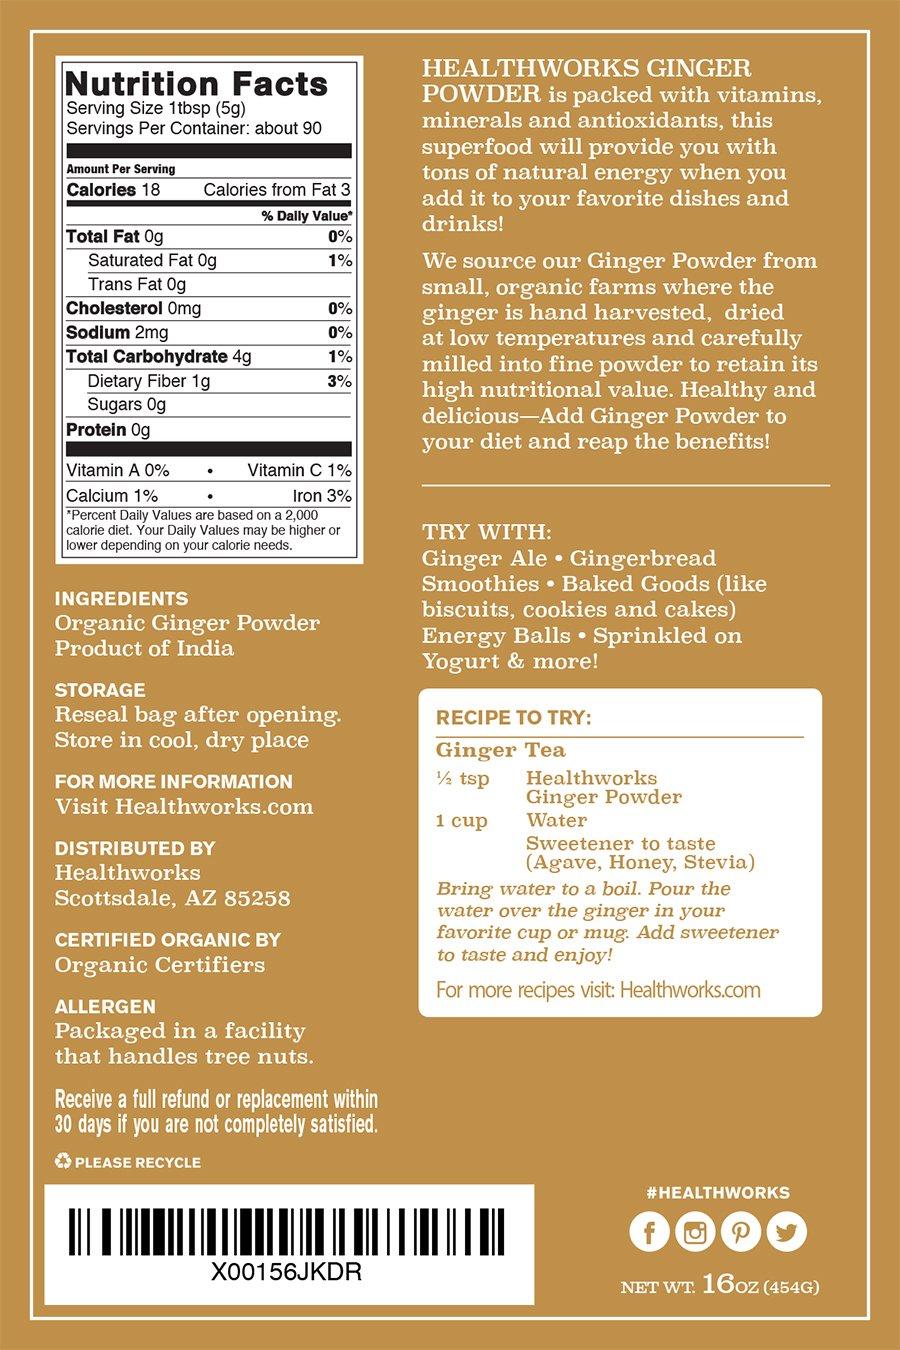 Healthworks Ginger Powder Raw Organic, 1lb by Healthworks (Image #6)